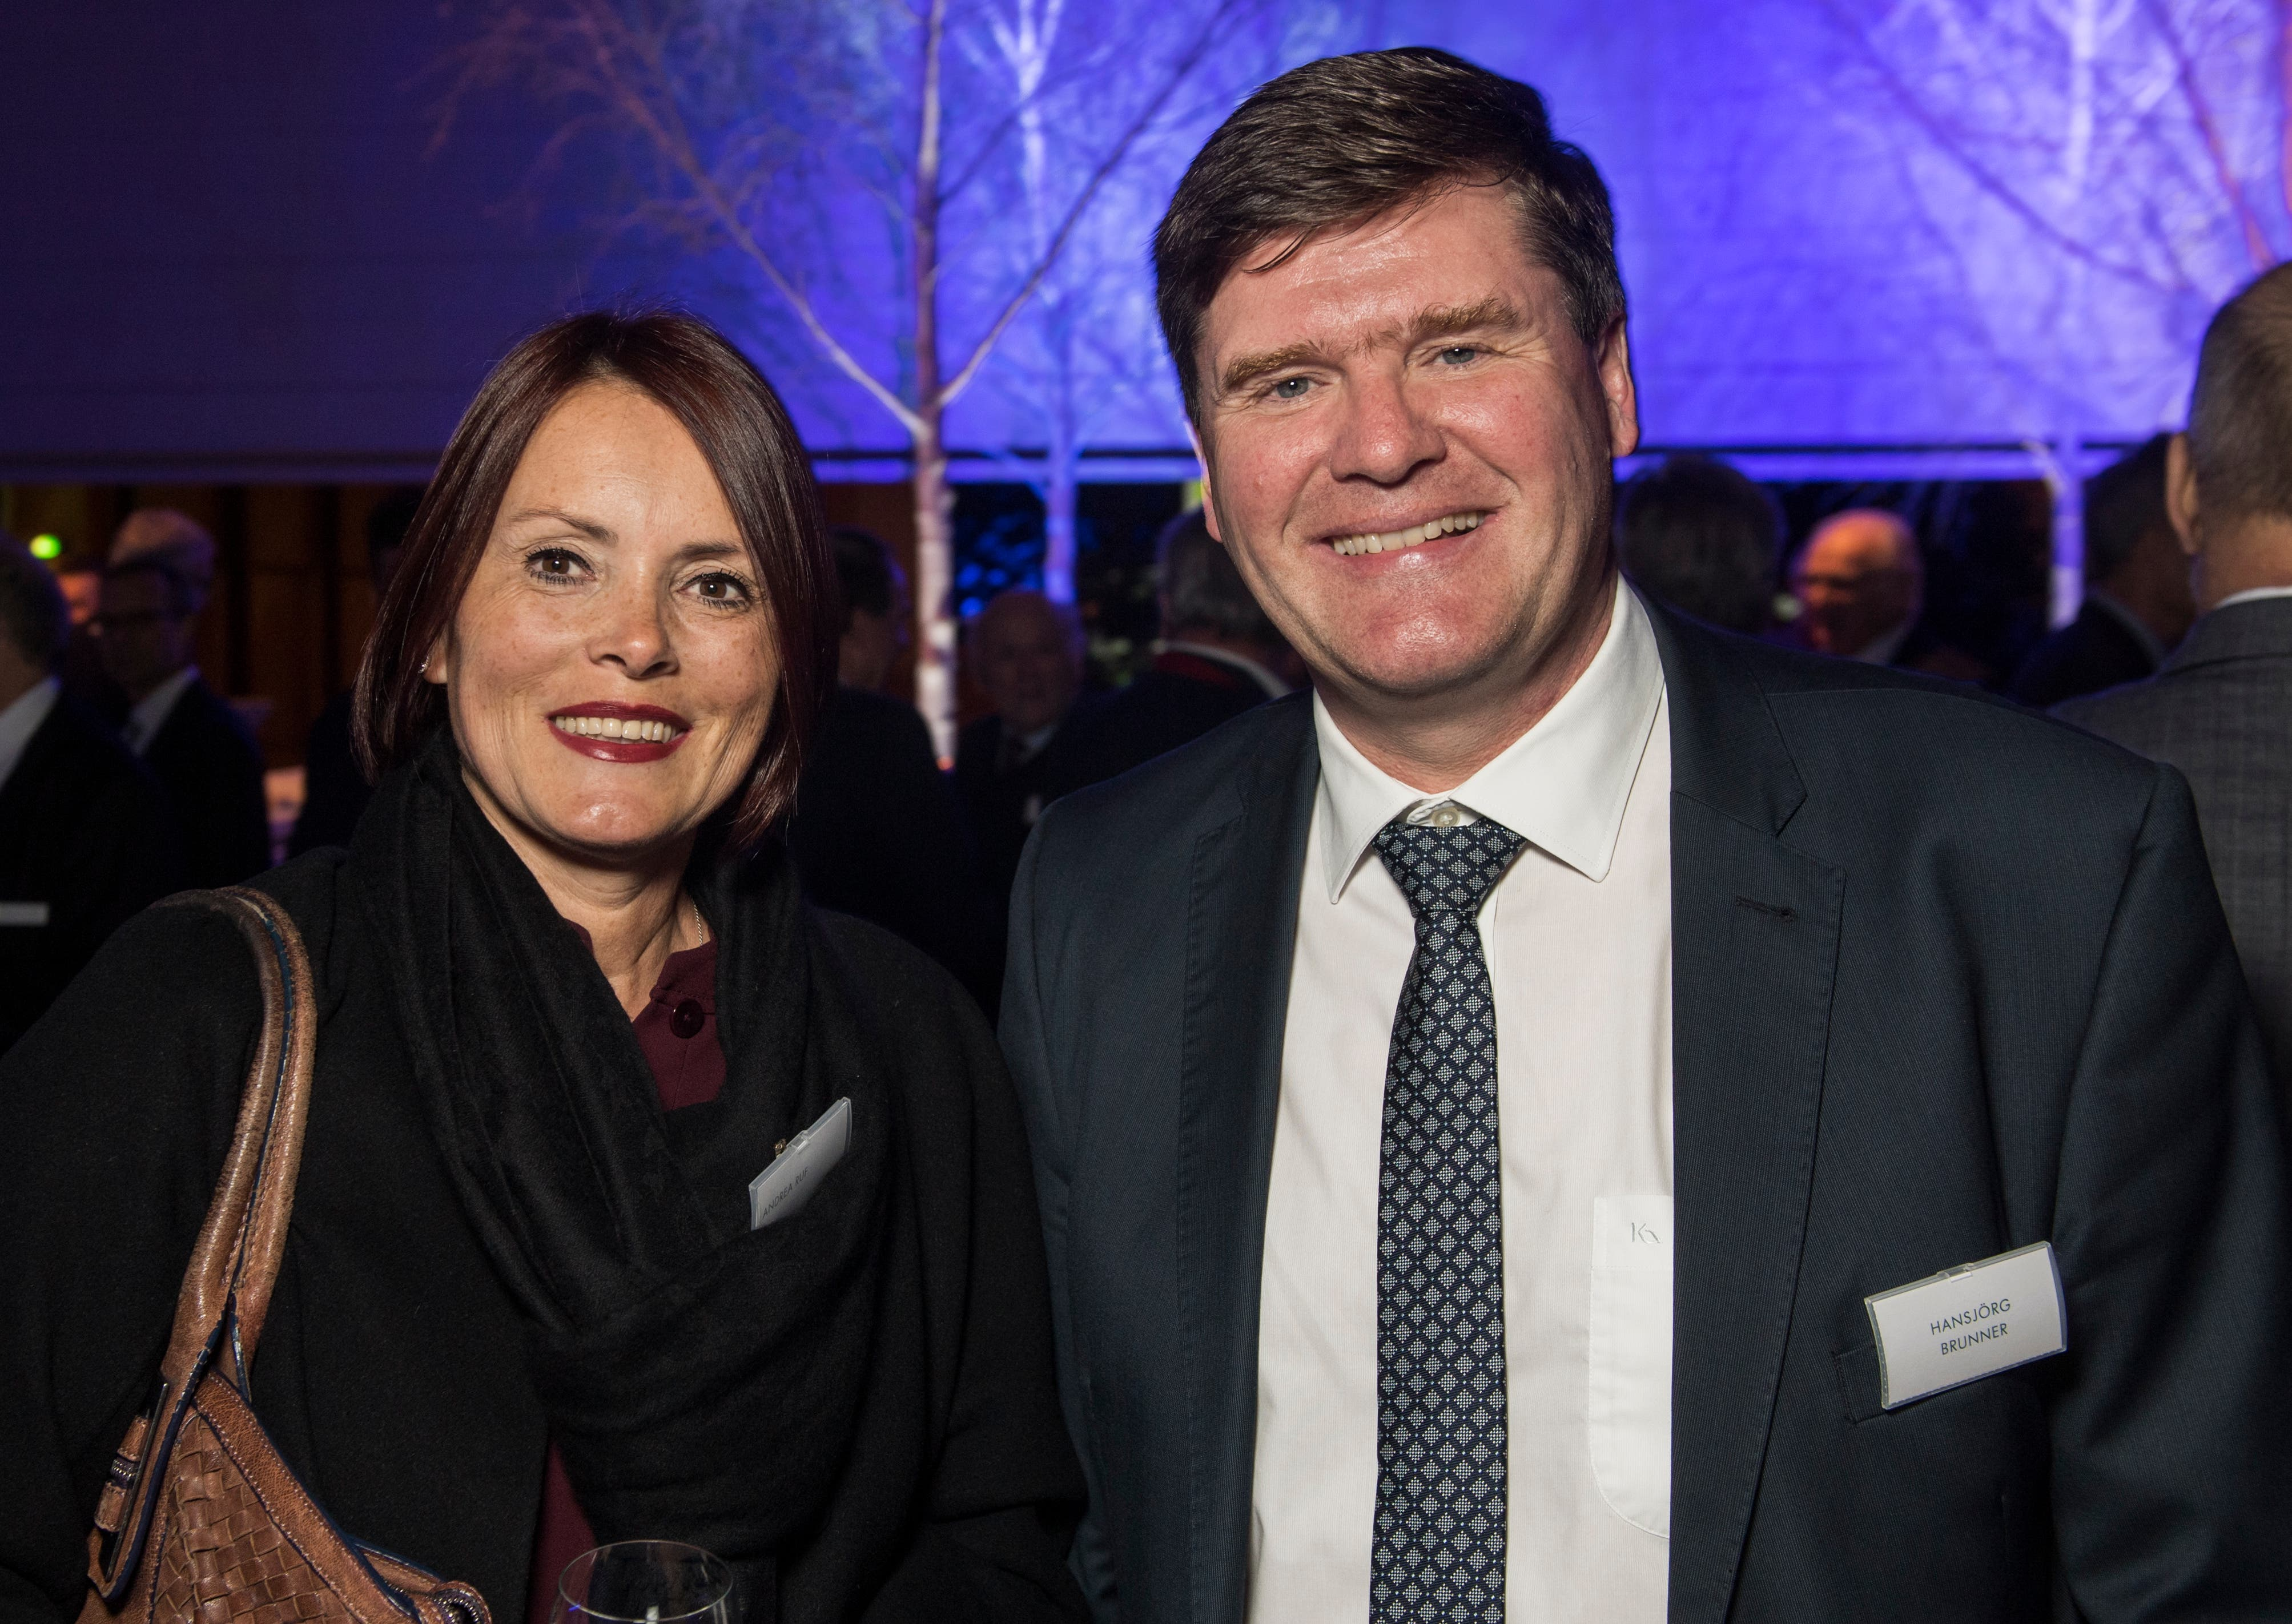 SBS-Chefin Andrea Ruf und FDP-Nationalrat Hansjörg Brunner am Neujahrsapéro 2019 der Thurgauer Kantonalbank im Seeparksaal Arbon. (Bilder: Reto Martin)